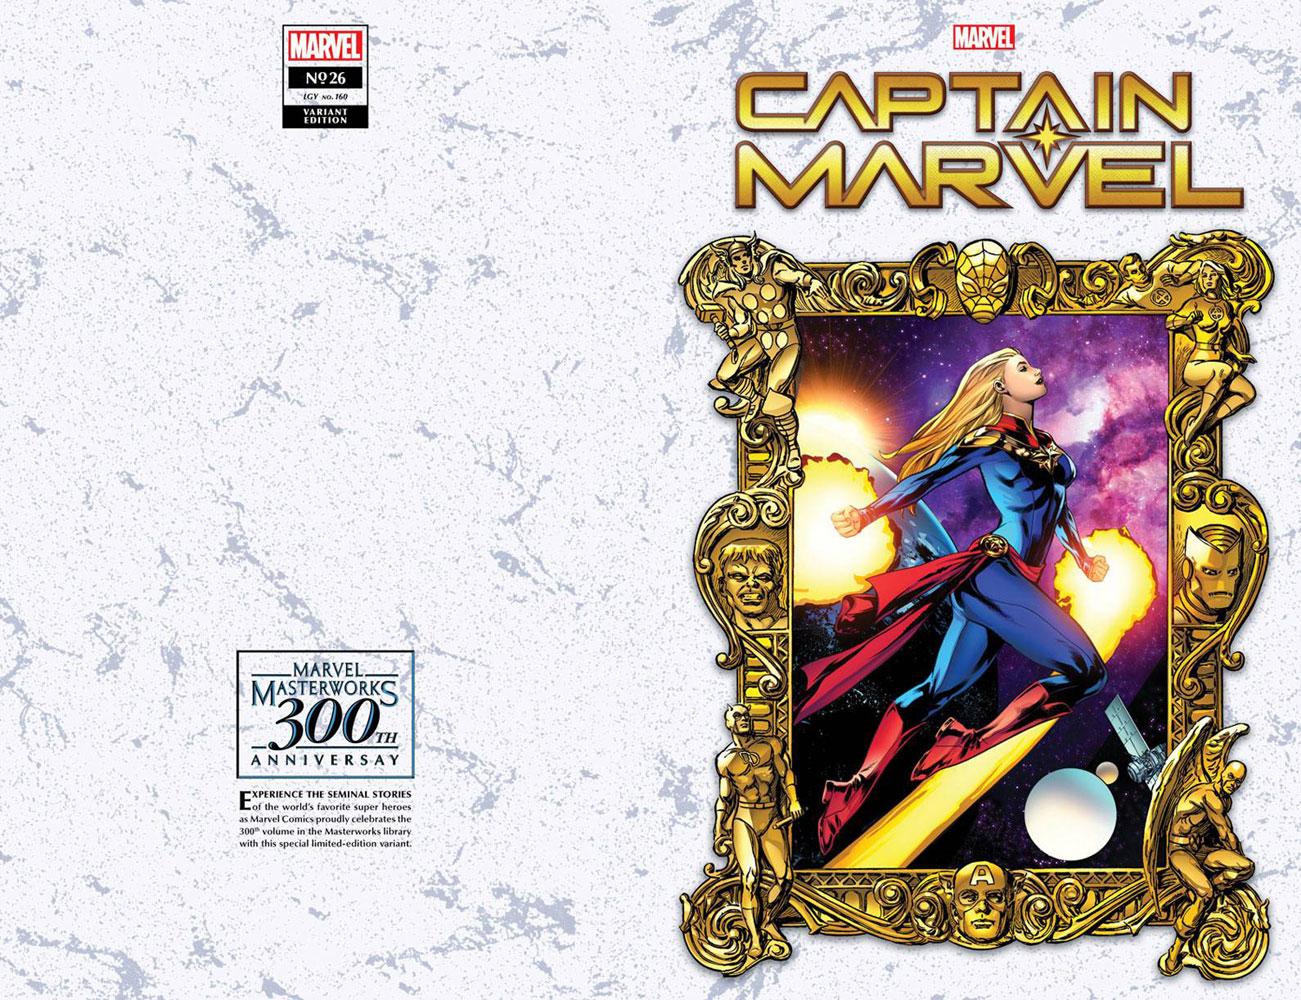 Captain Marvel #26 (variant Masterworks cover - Lupacchino)  [2021] - Marvel Comics